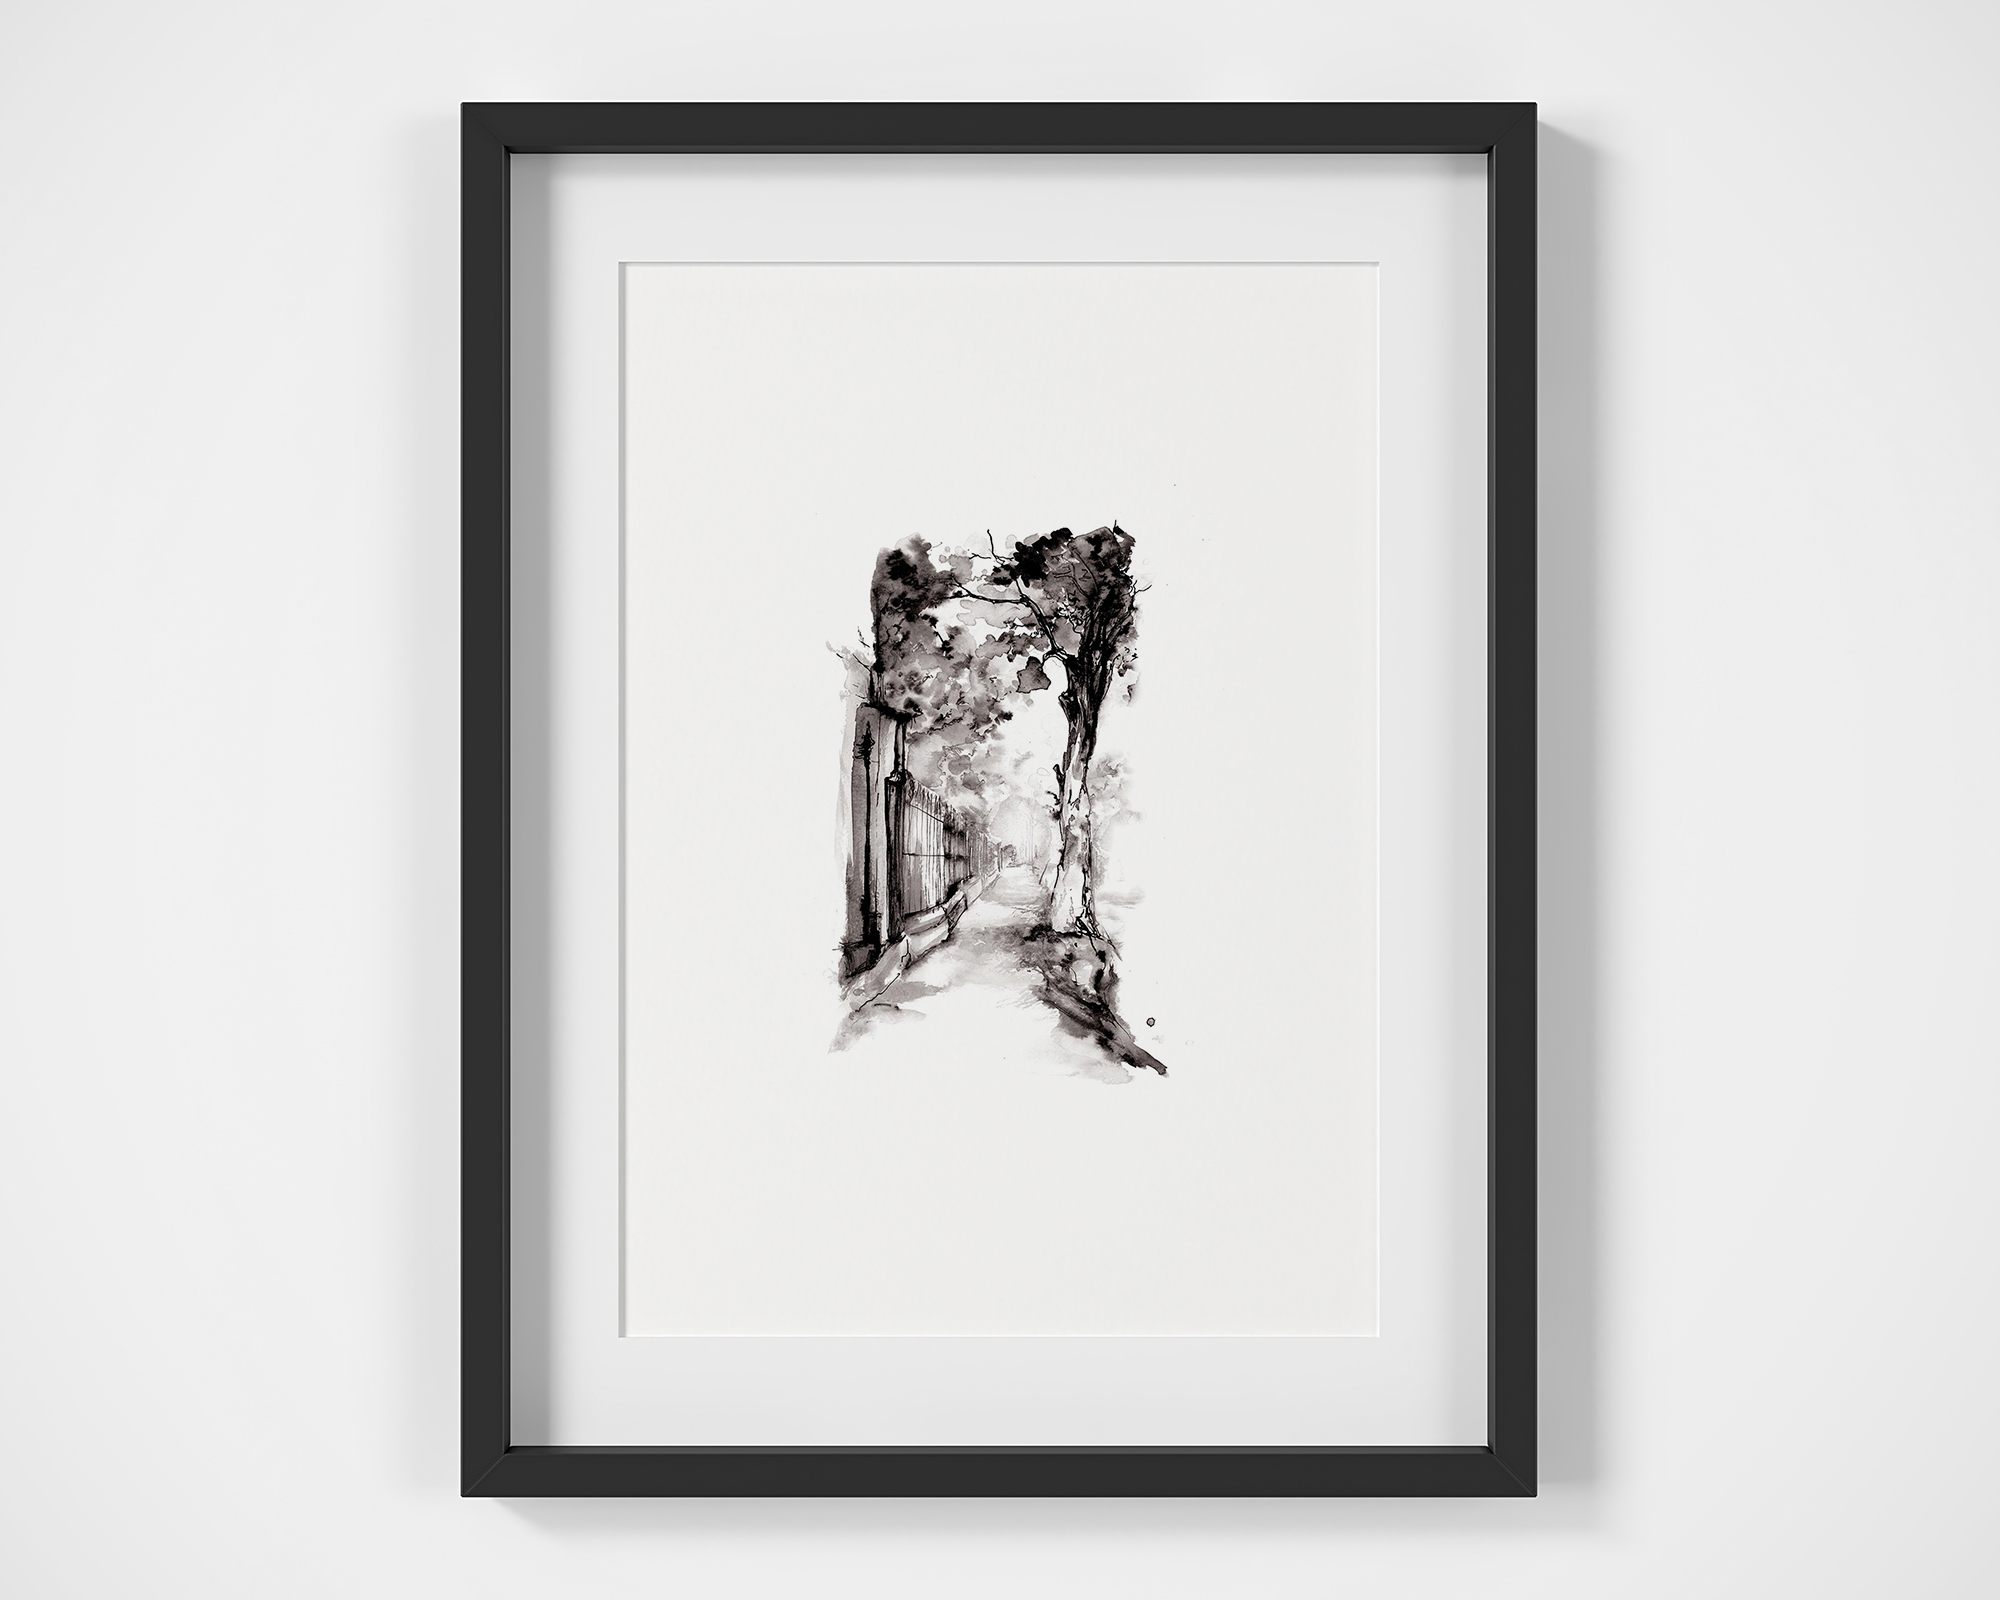 'Sidewalk'.  Fine Art Print by Artist, Dana Trijbetz.  Original Ink Painting made as a Giclée Print on 100% Cotton Paper.  Image 1 of 3.jpg